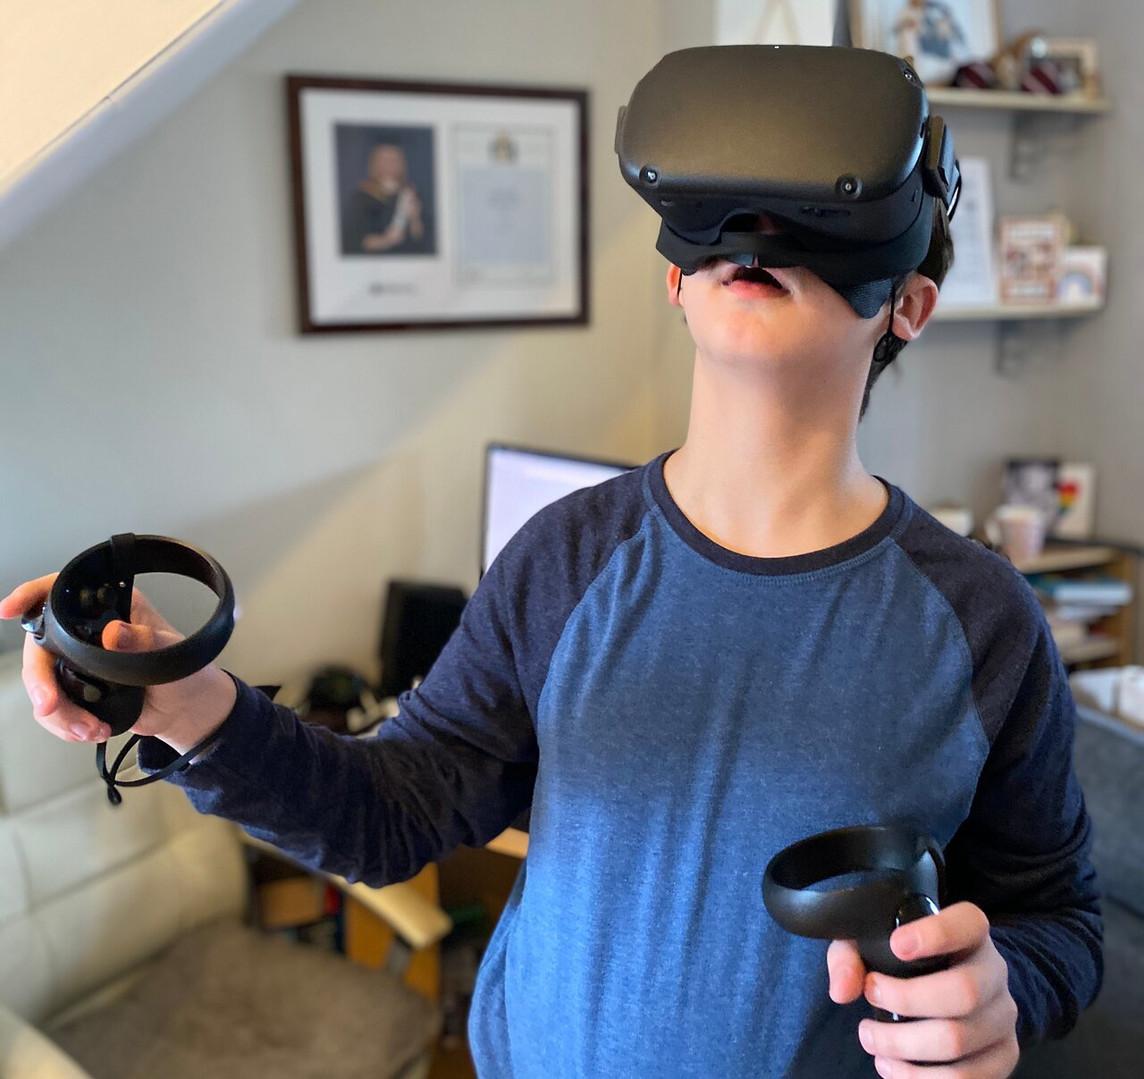 xp-vr-virtual-reality.jpg